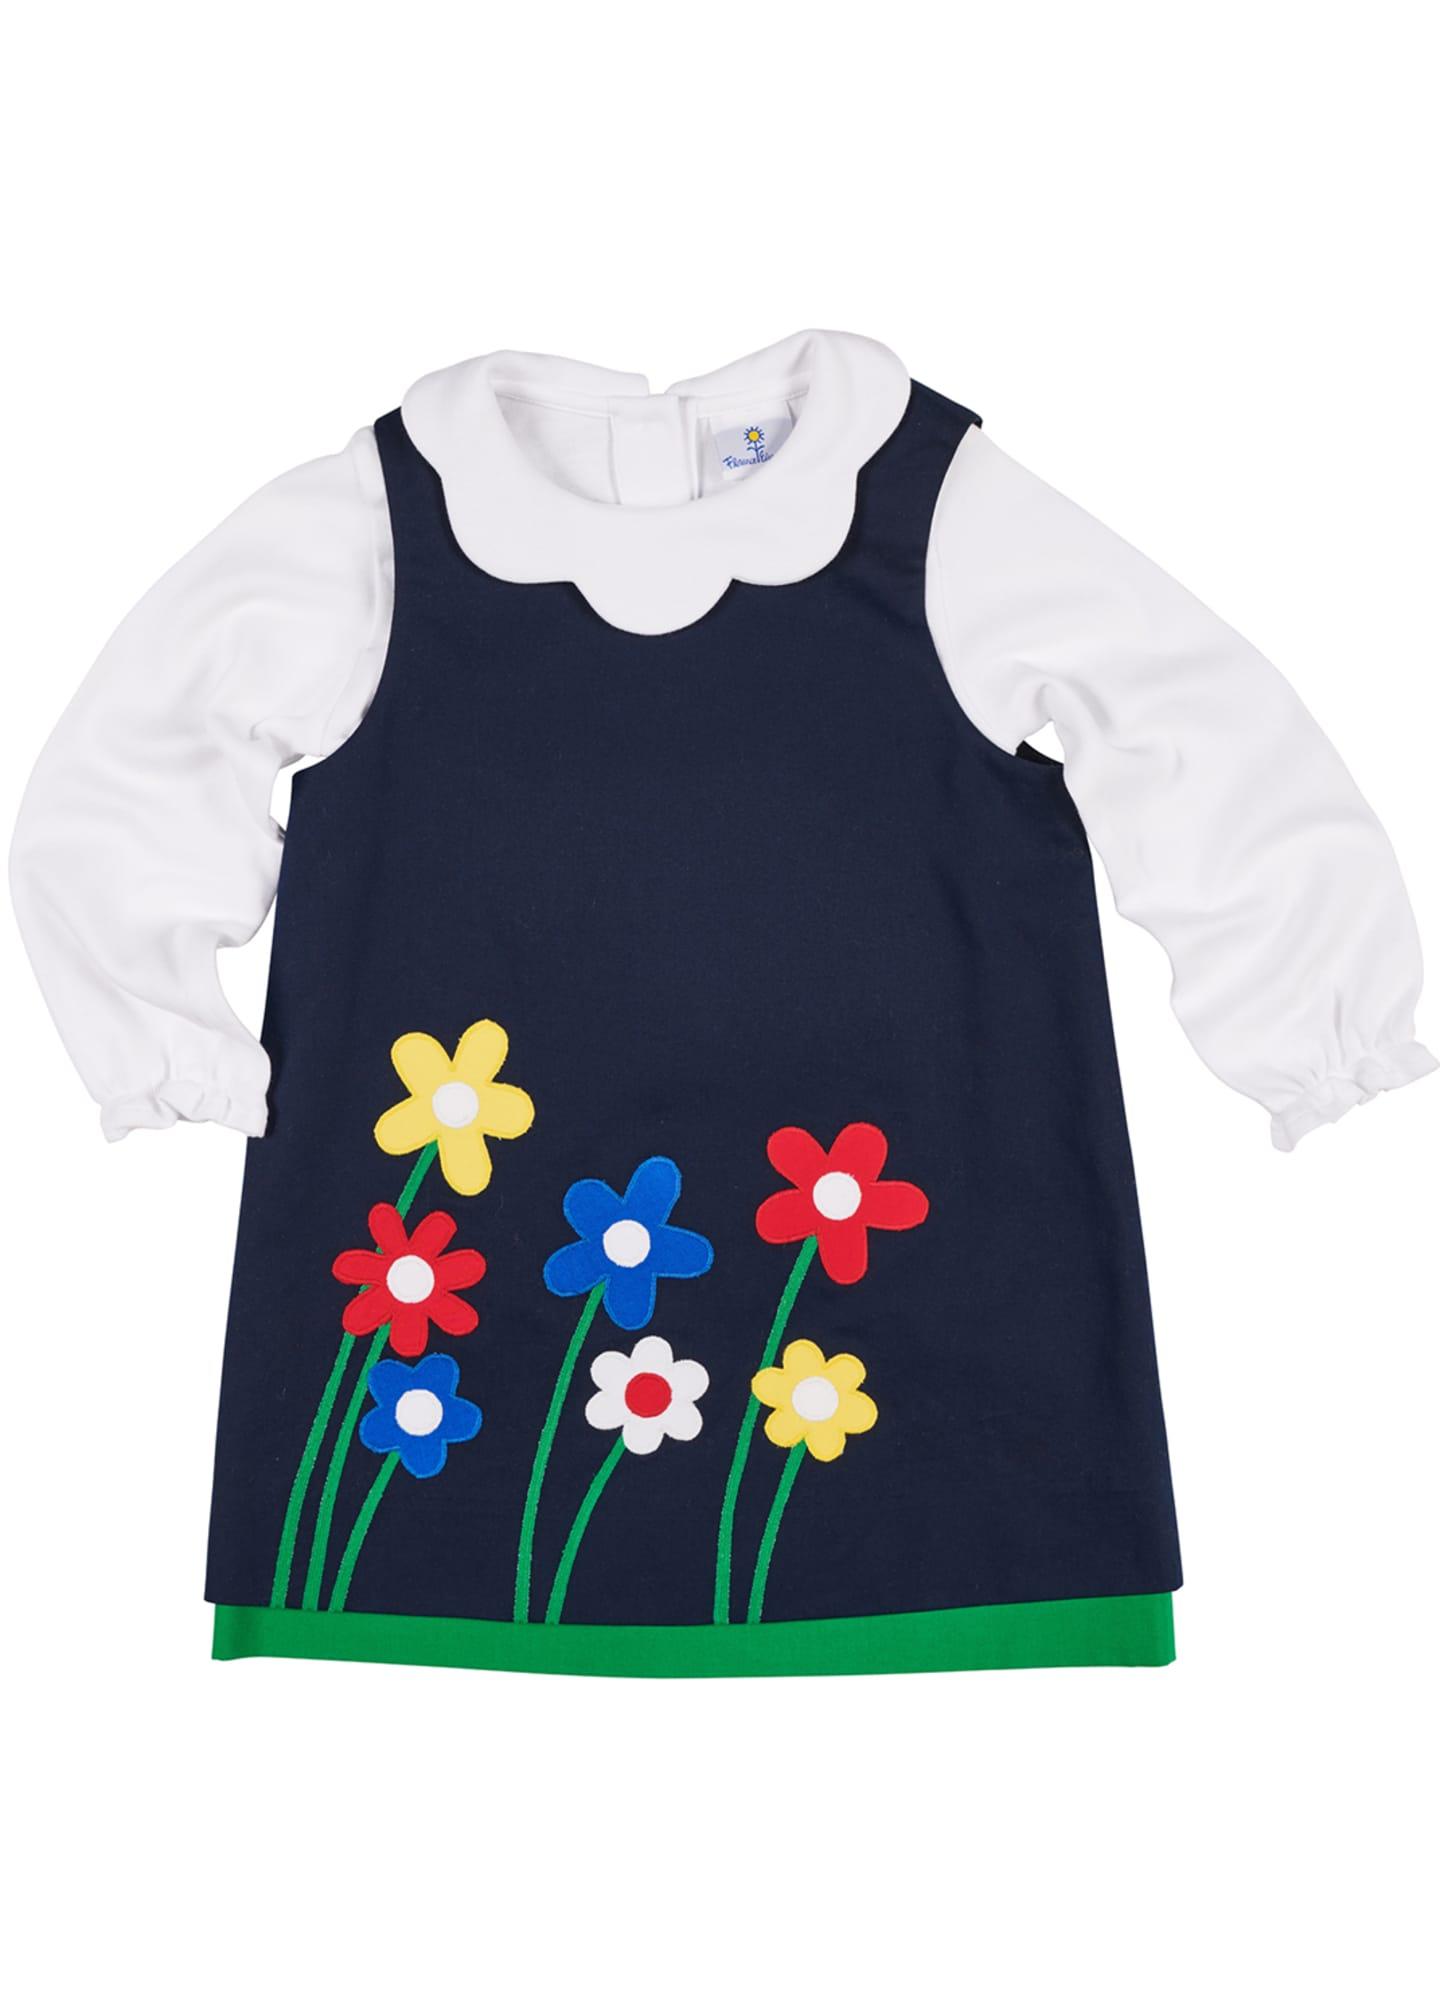 Florence Eiseman Twill Flower Appliqué Dress w/